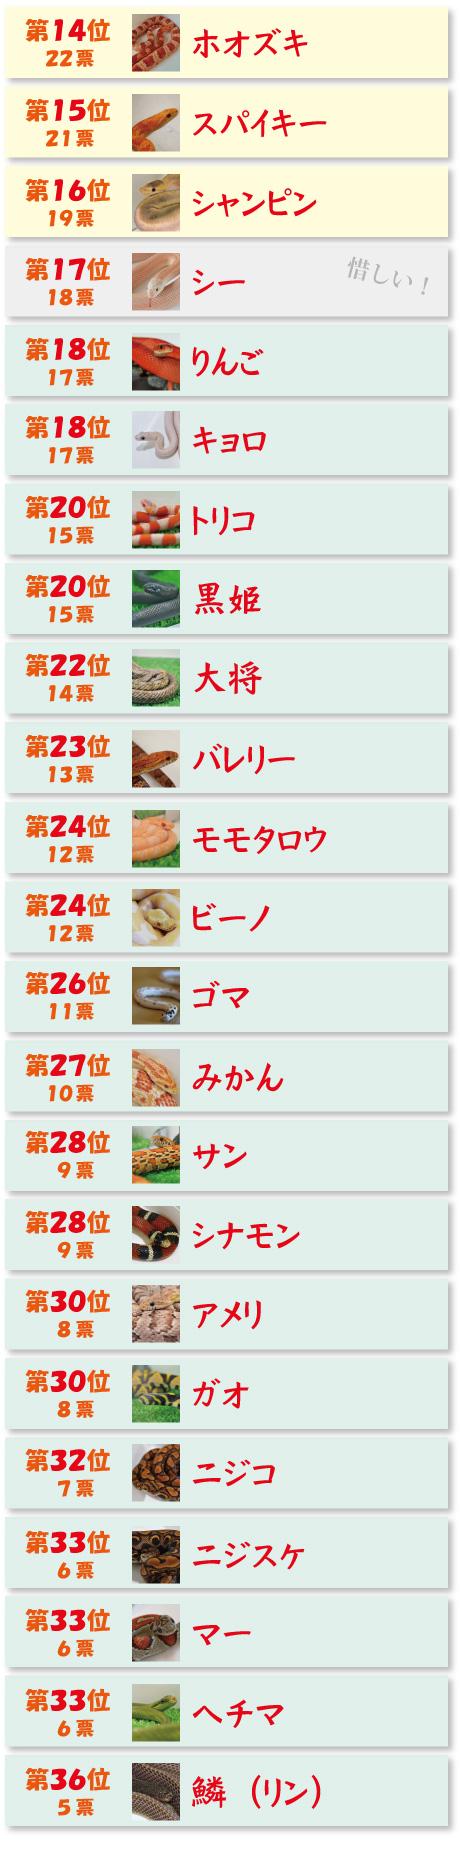 web_senkyo_result14-36